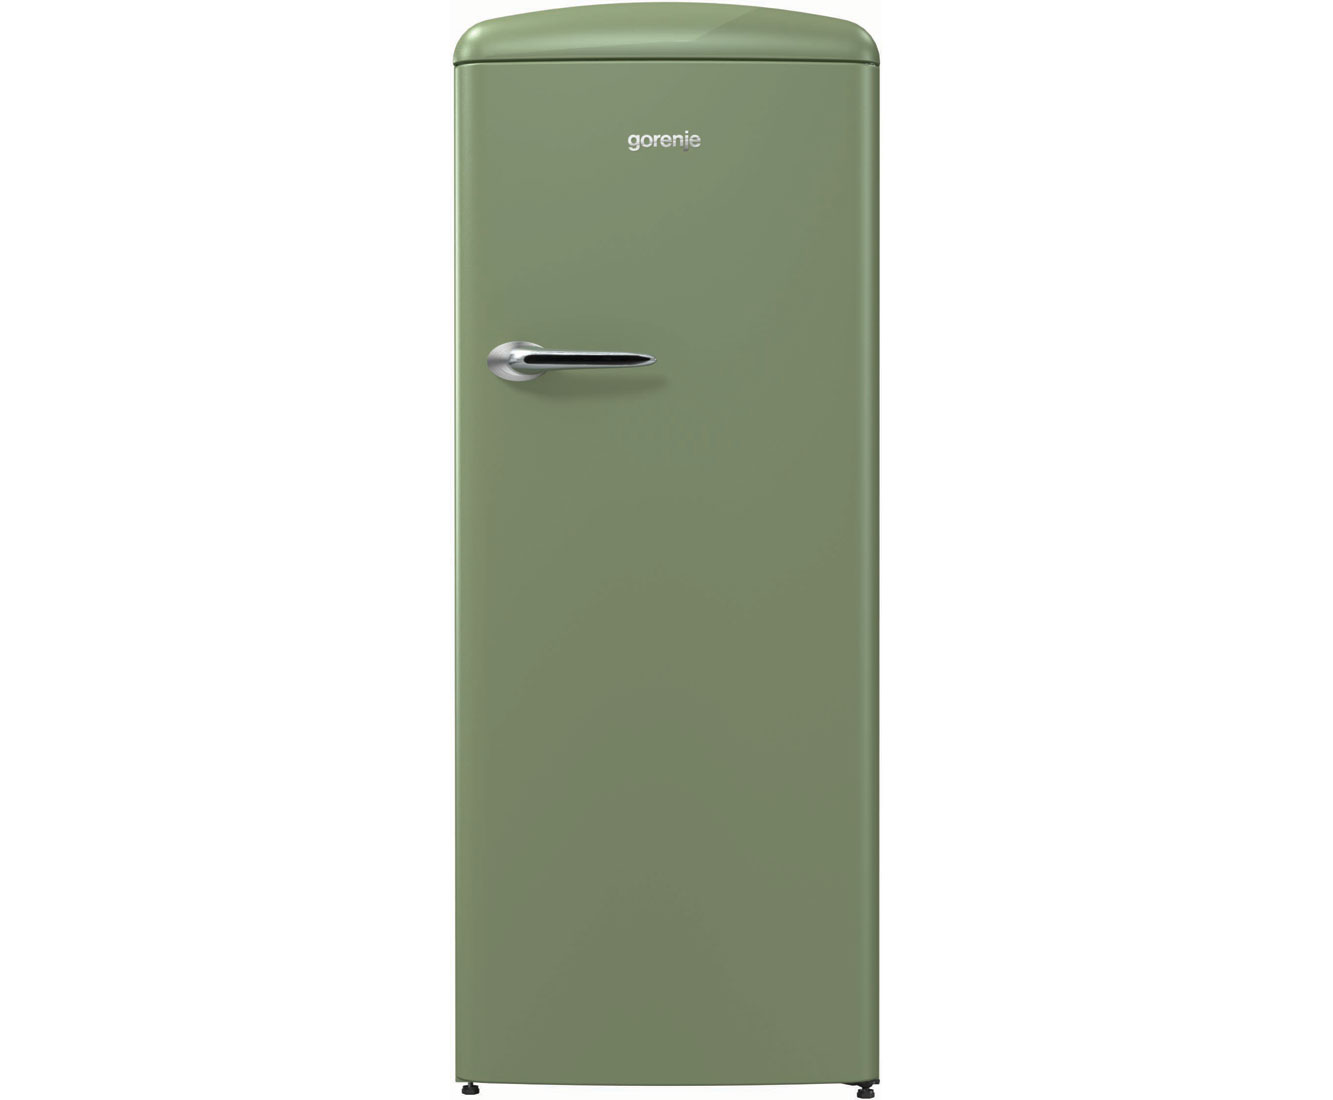 Gorenje Kühlschrank Creme : Gorenje kühlschrank creme: kühlschrank retro gorenje einzigartig